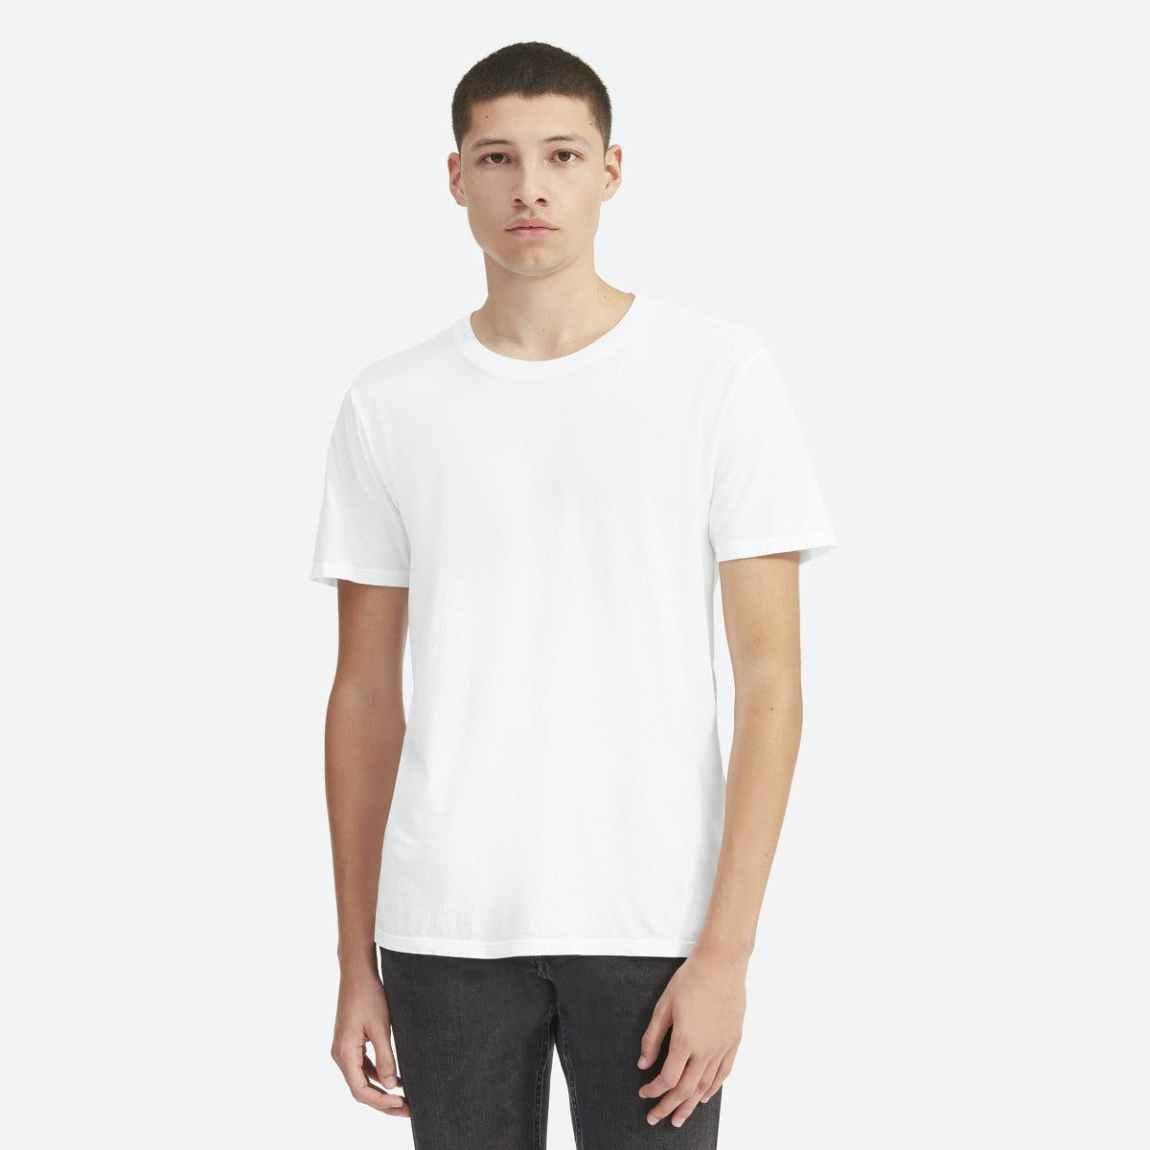 everlane, everlane t shirt, t shirt, white t shirt, denimblog, denim blog